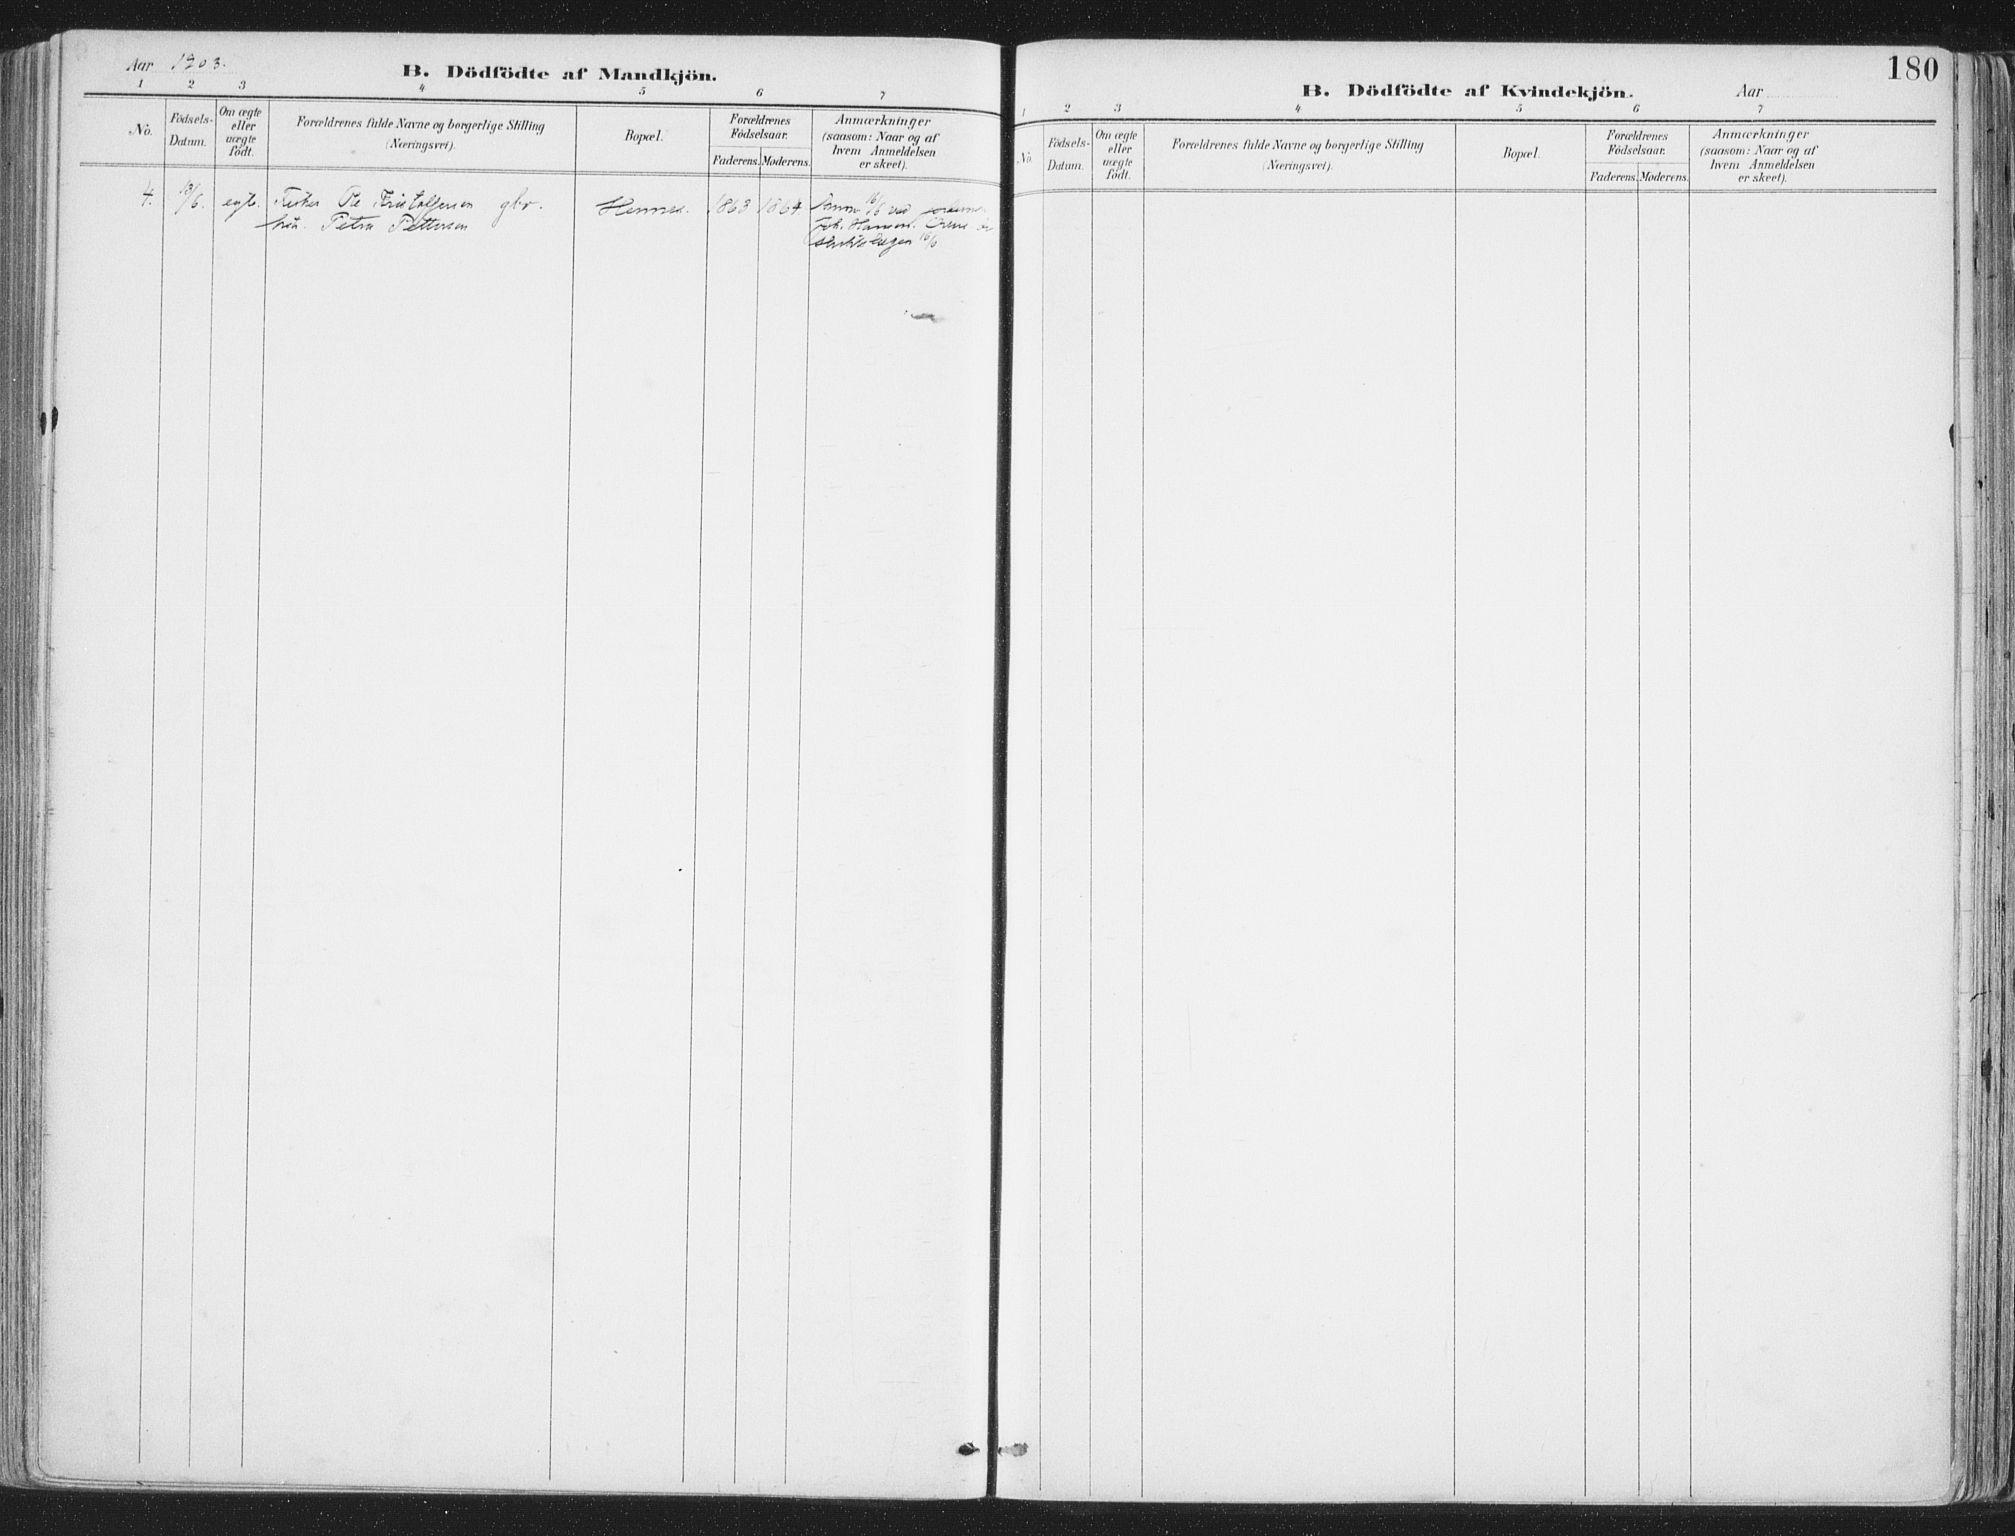 SAT, Ministerialprotokoller, klokkerbøker og fødselsregistre - Nordland, 888/L1246: Ministerialbok nr. 888A12, 1891-1903, s. 180